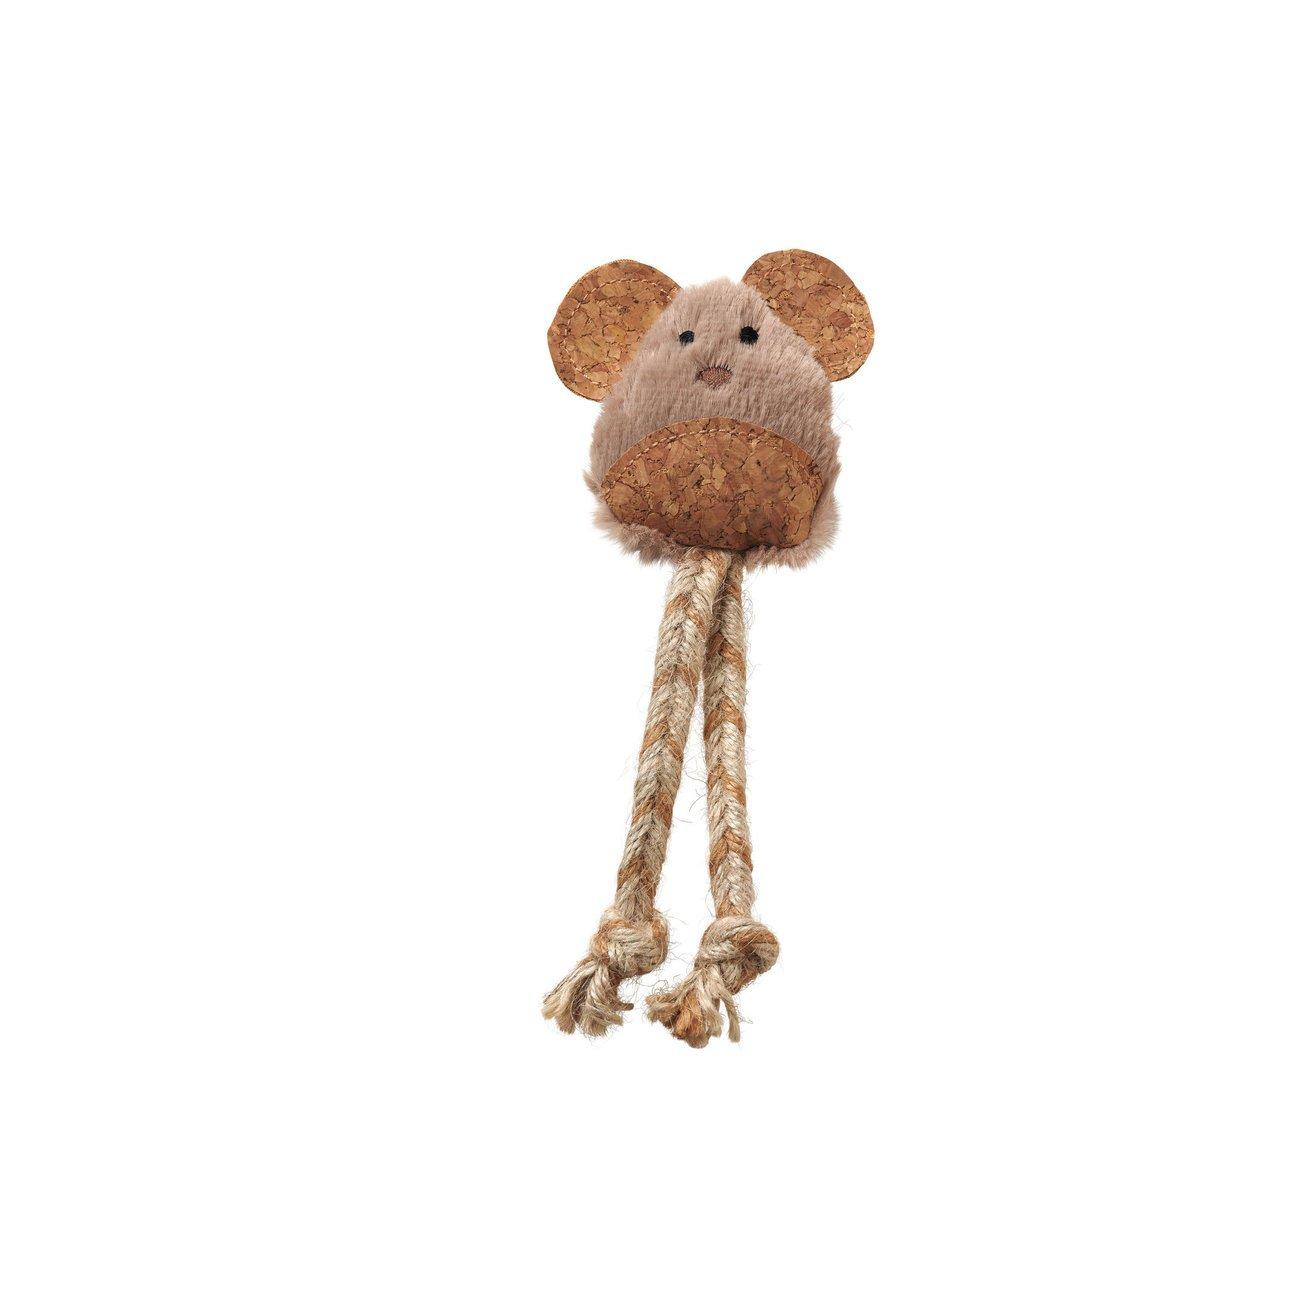 Hunter Katzenspielzeug Moa, Maus, 17 cm